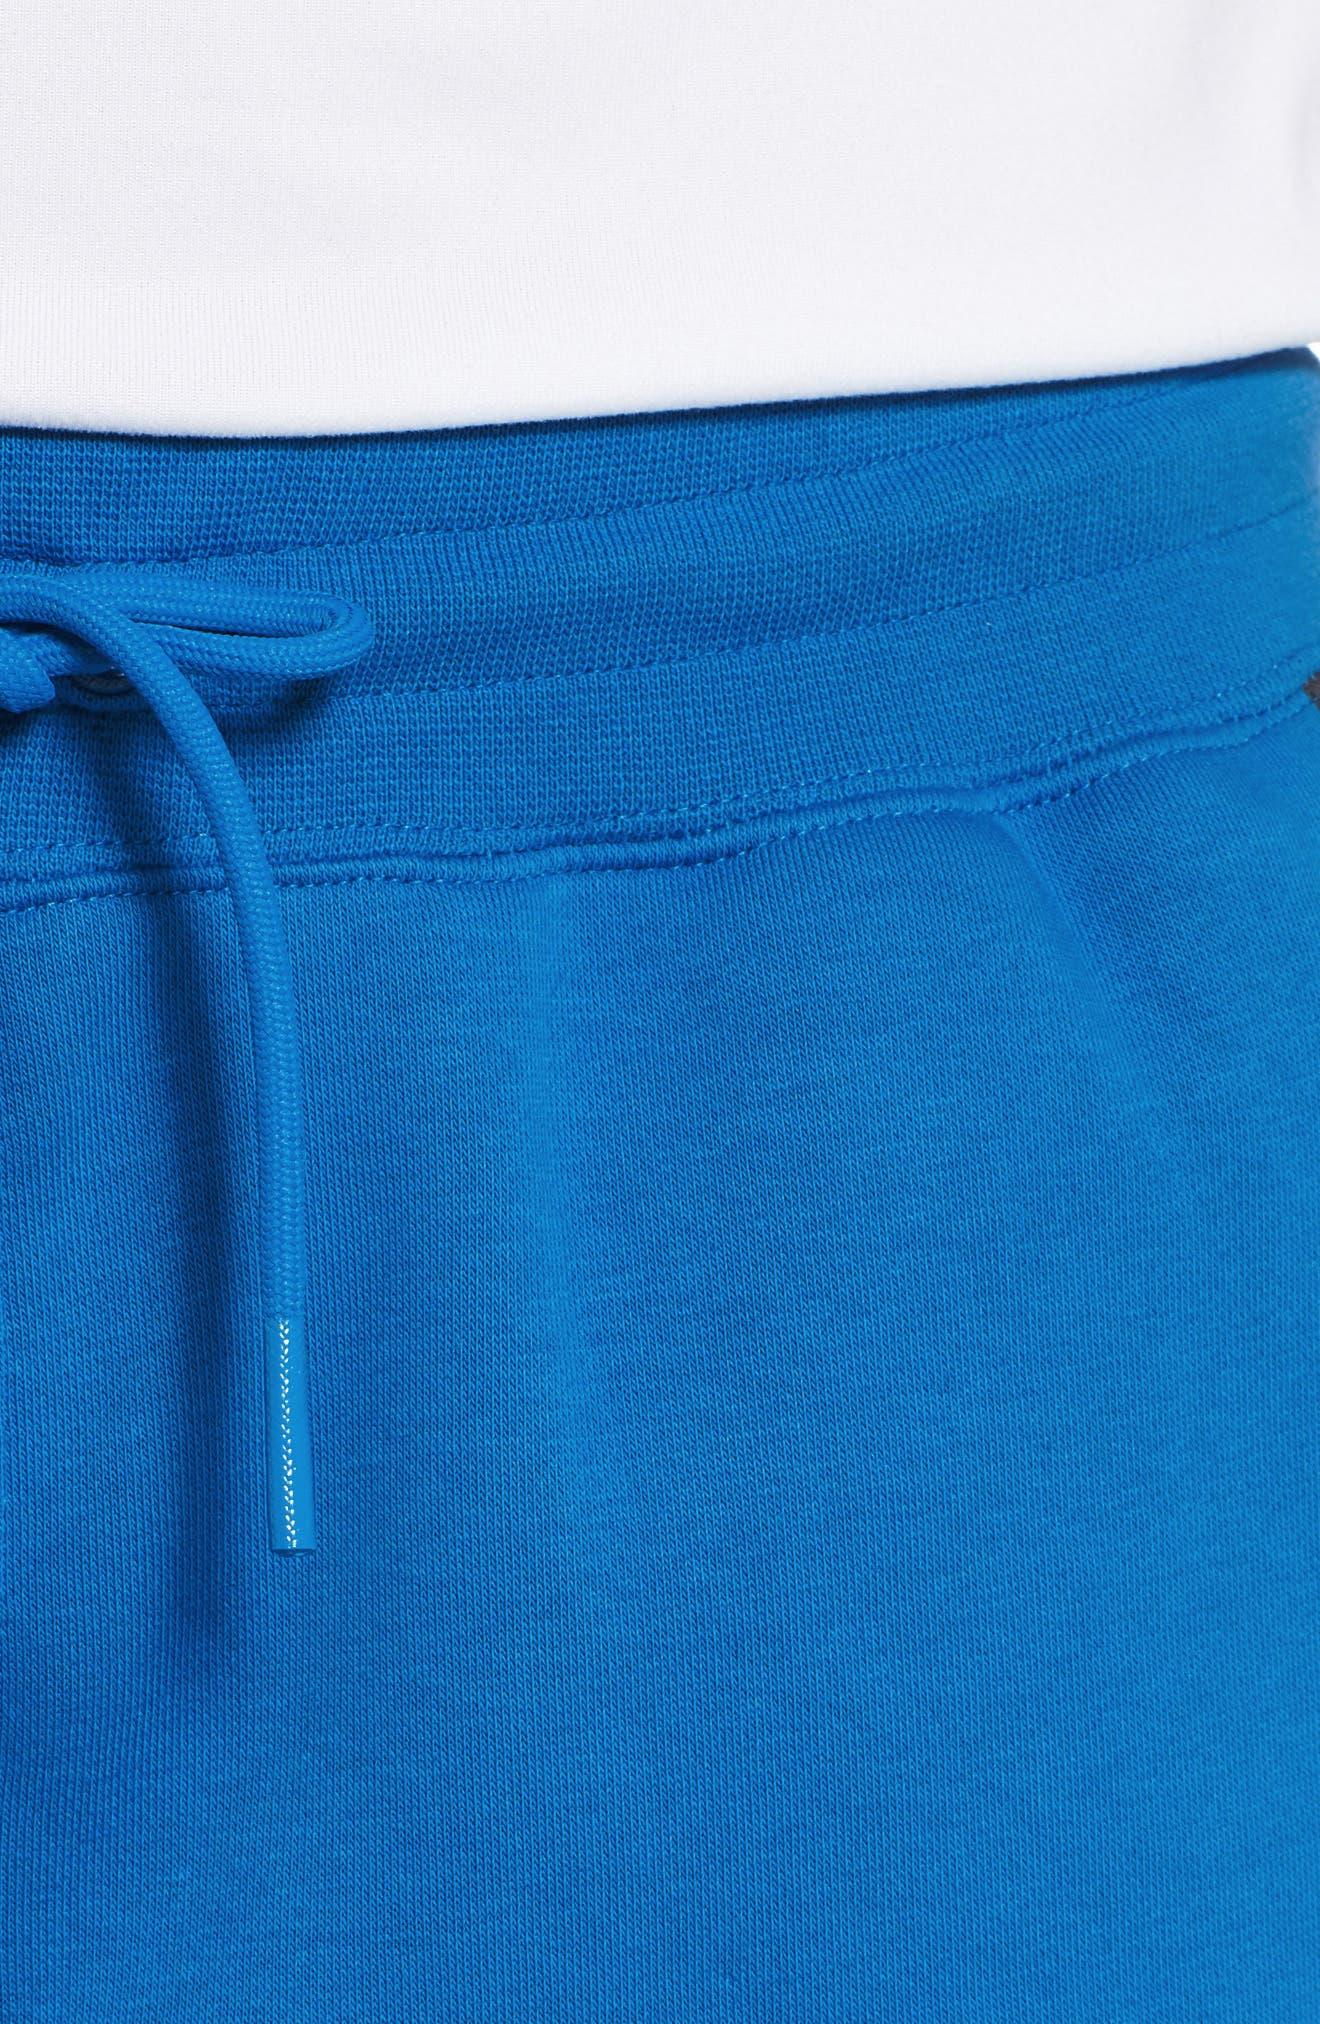 Sportswear Air Fleece Shorts,                             Alternate thumbnail 4, color,                             Blue Nebula/ Anthracite/ White